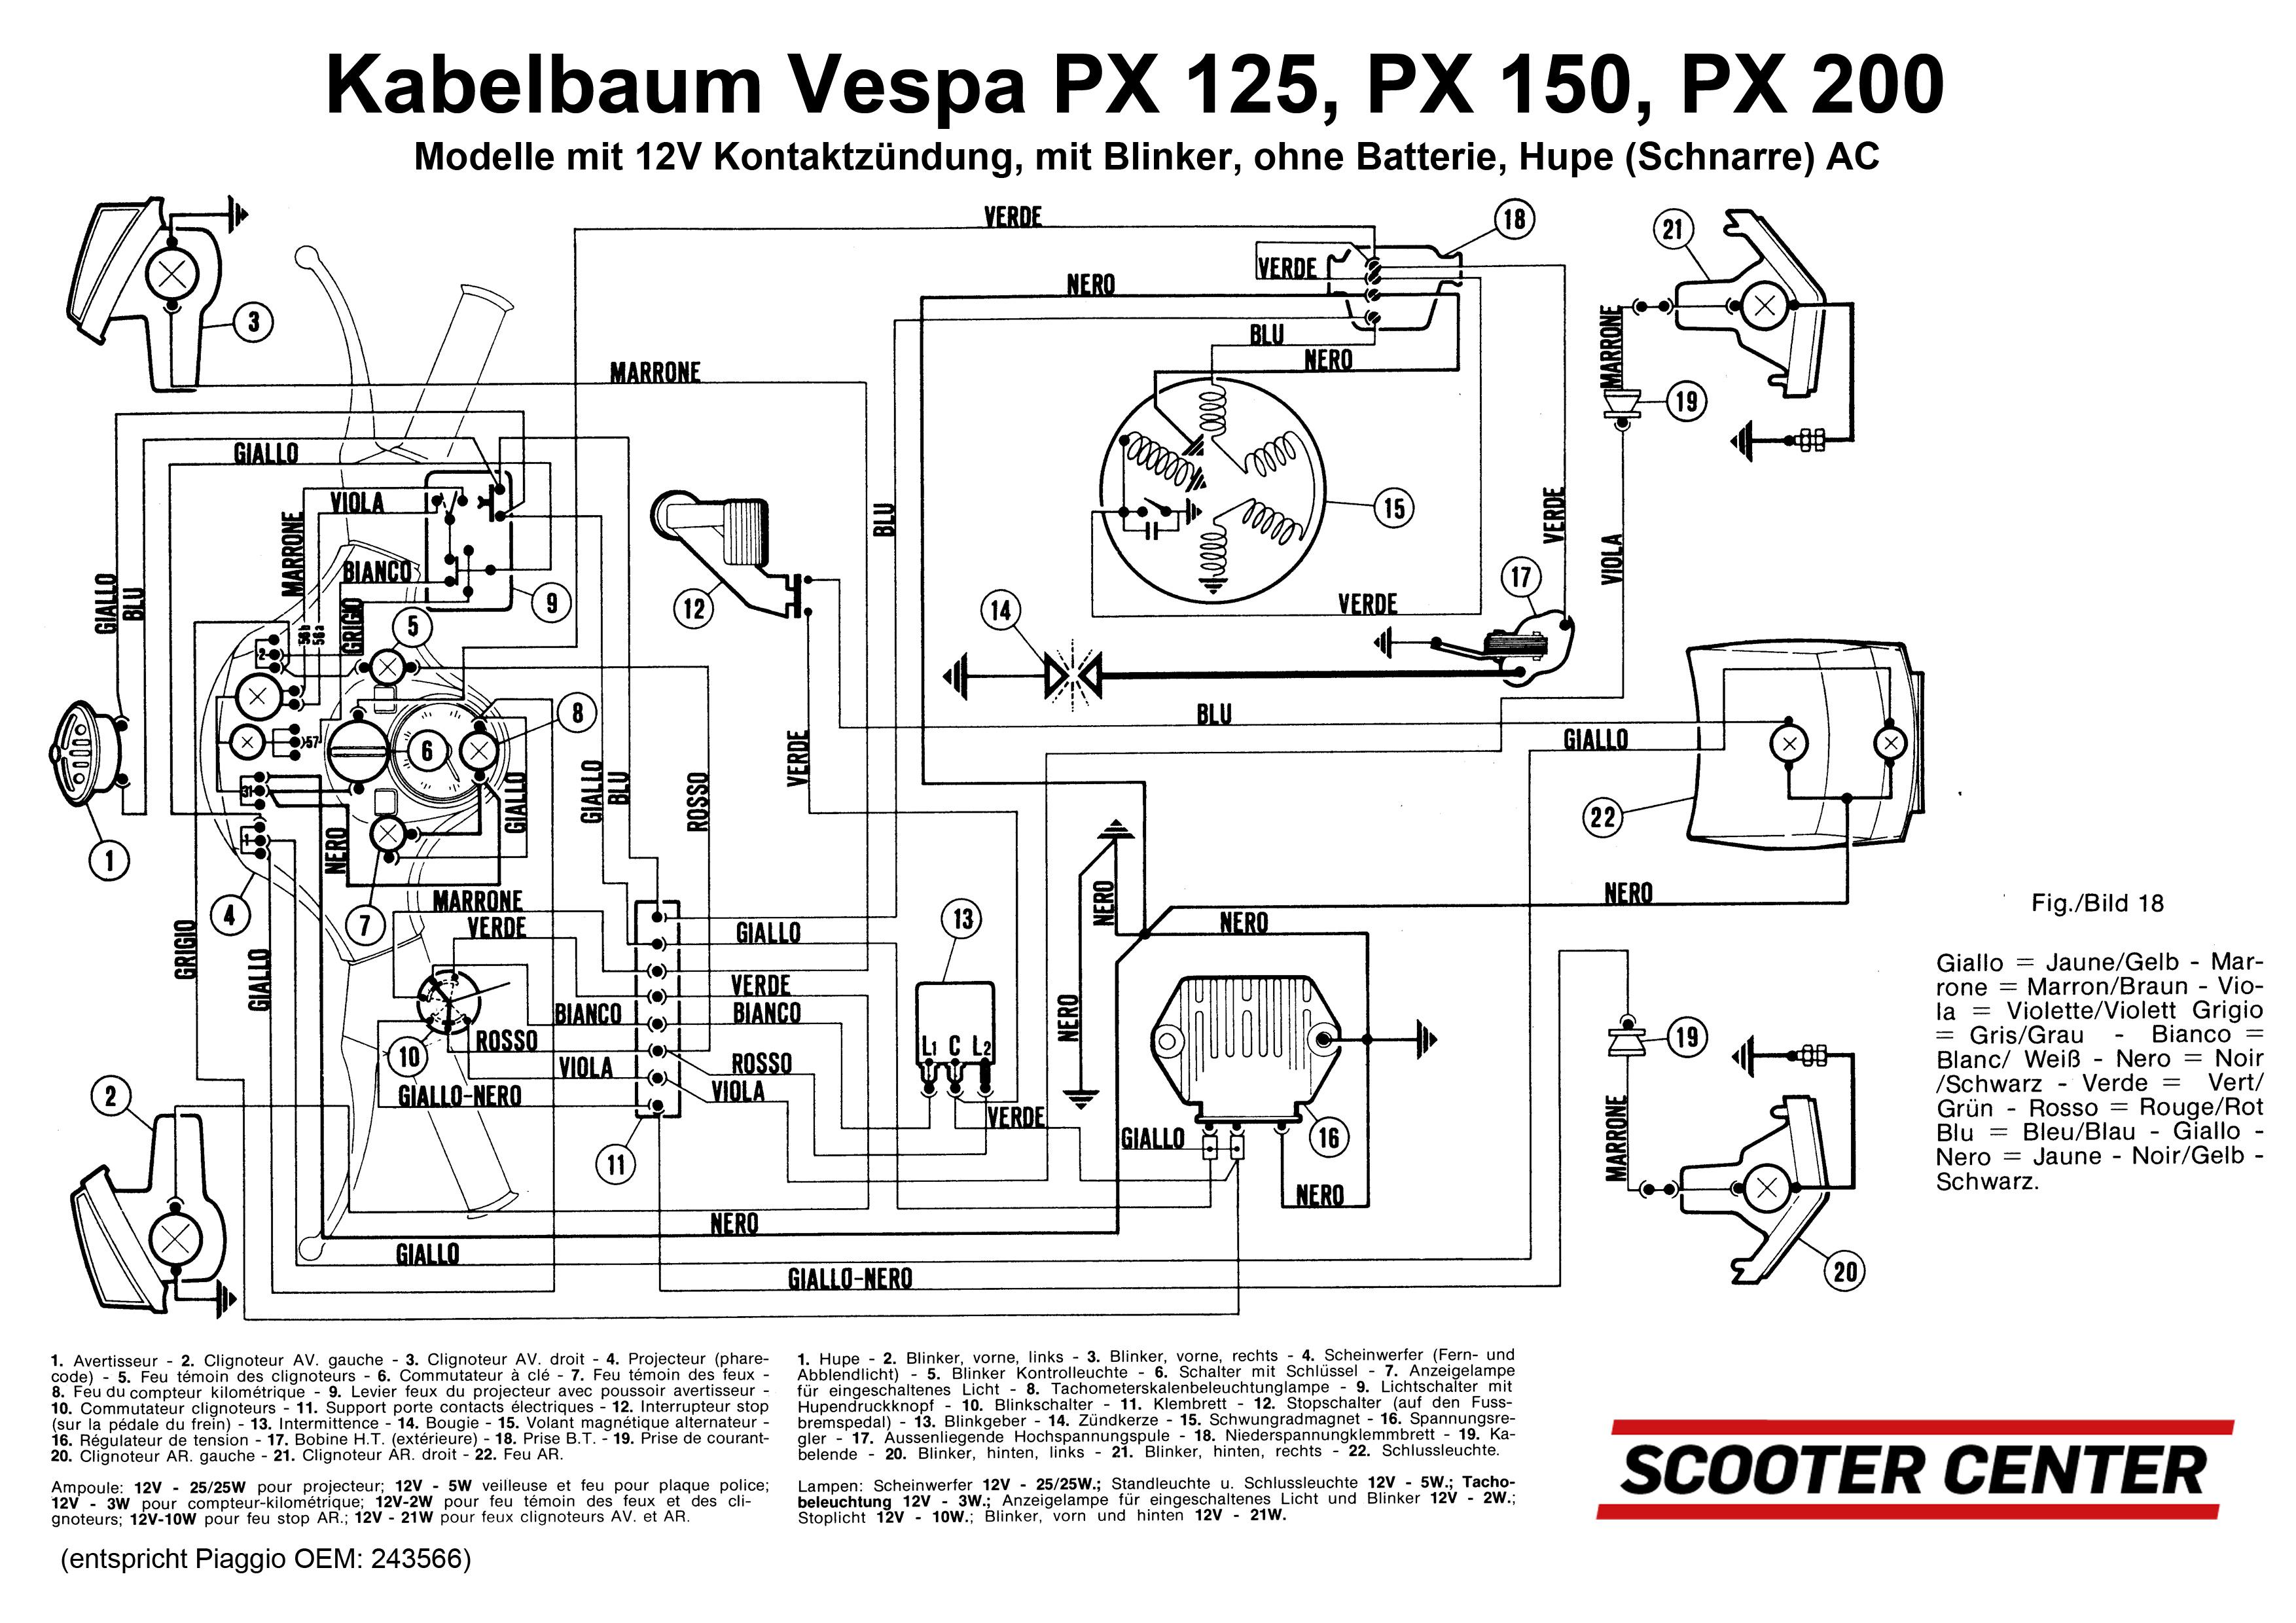 Wiring Diagram Vespa Px 150 - Wiring Diagram